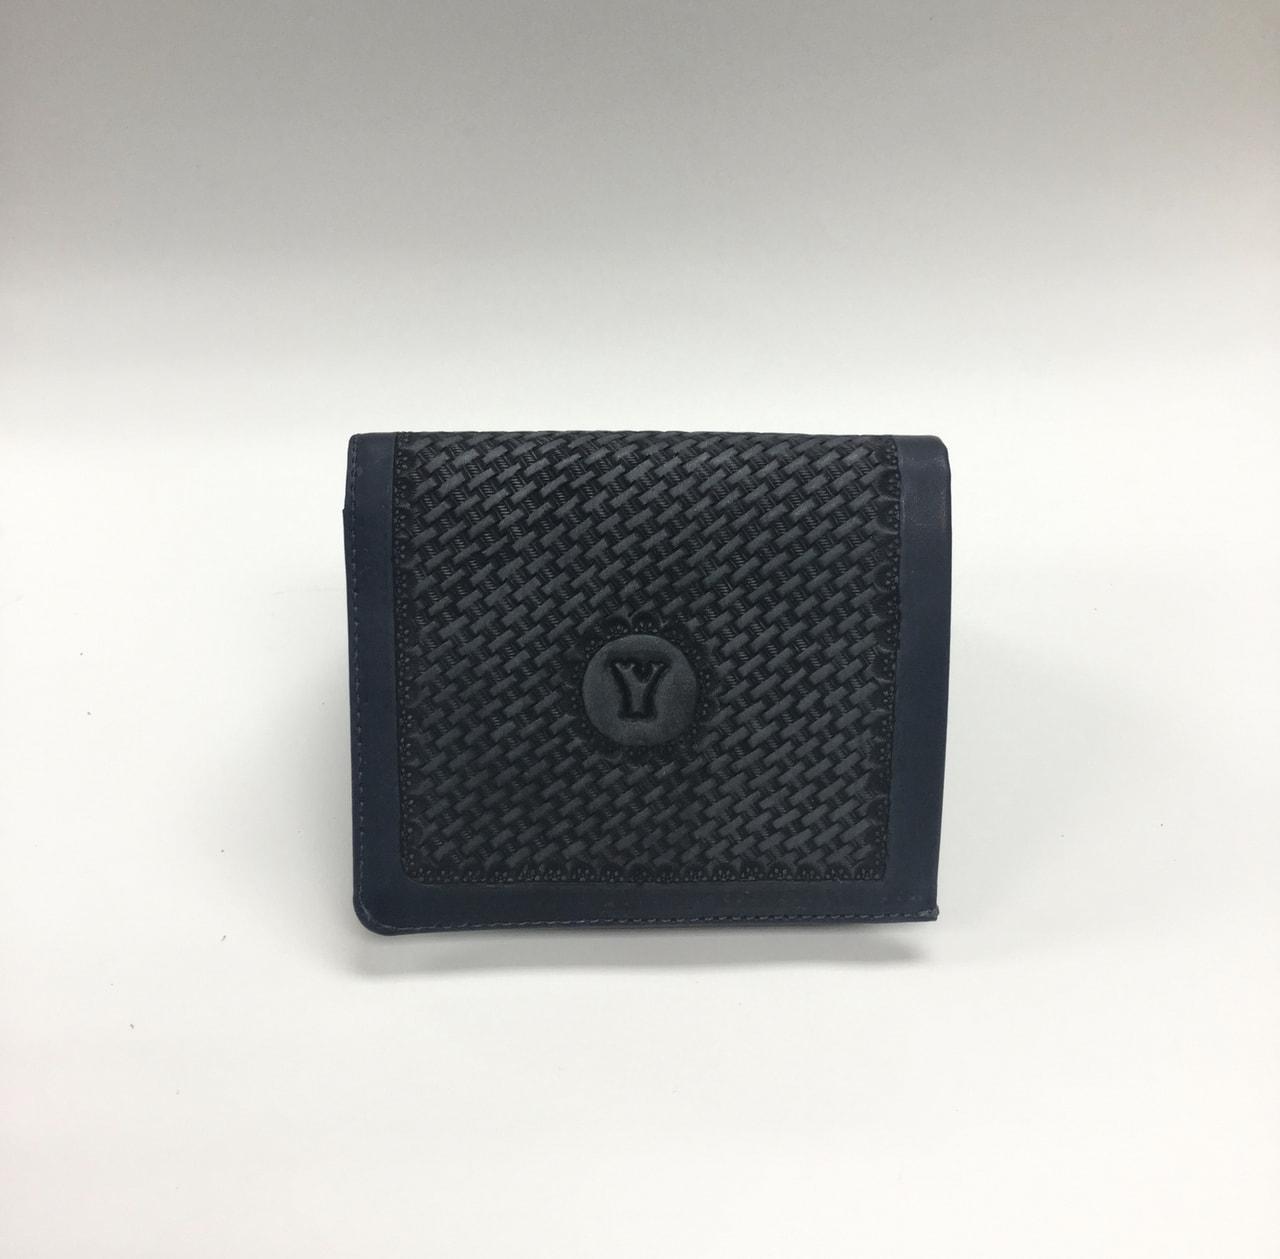 Oさんの財布